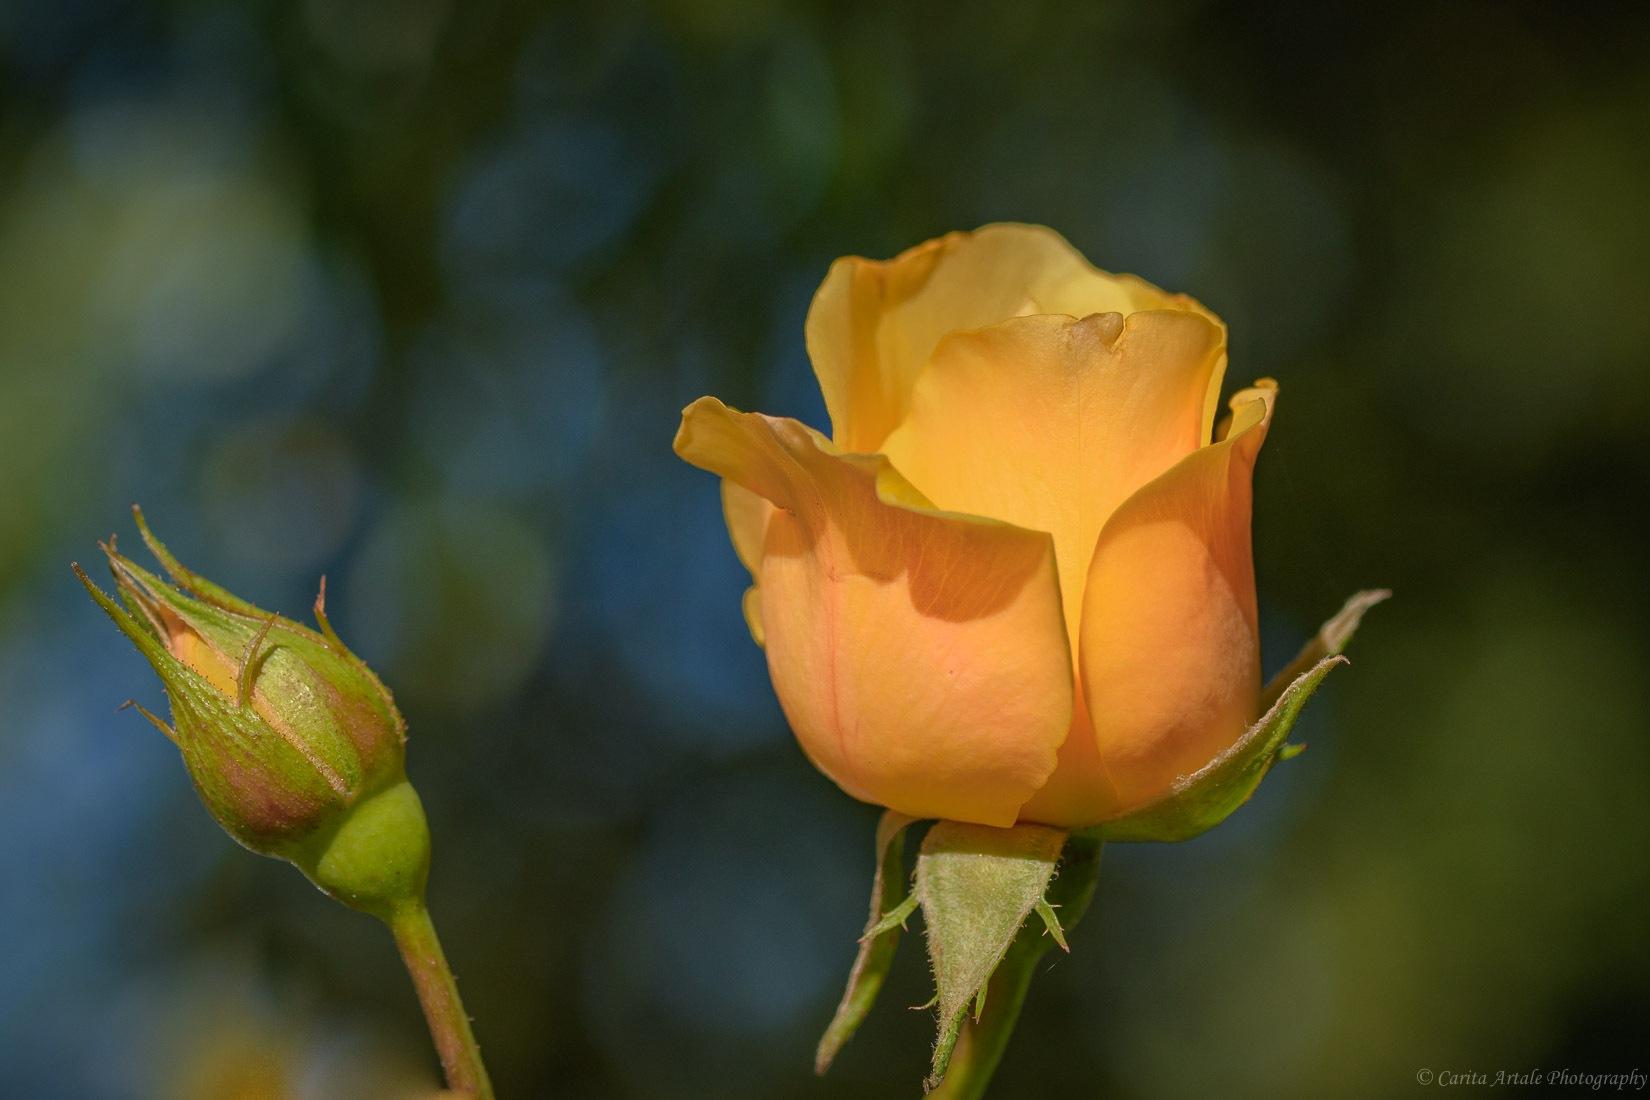 Yellow rose by Carita